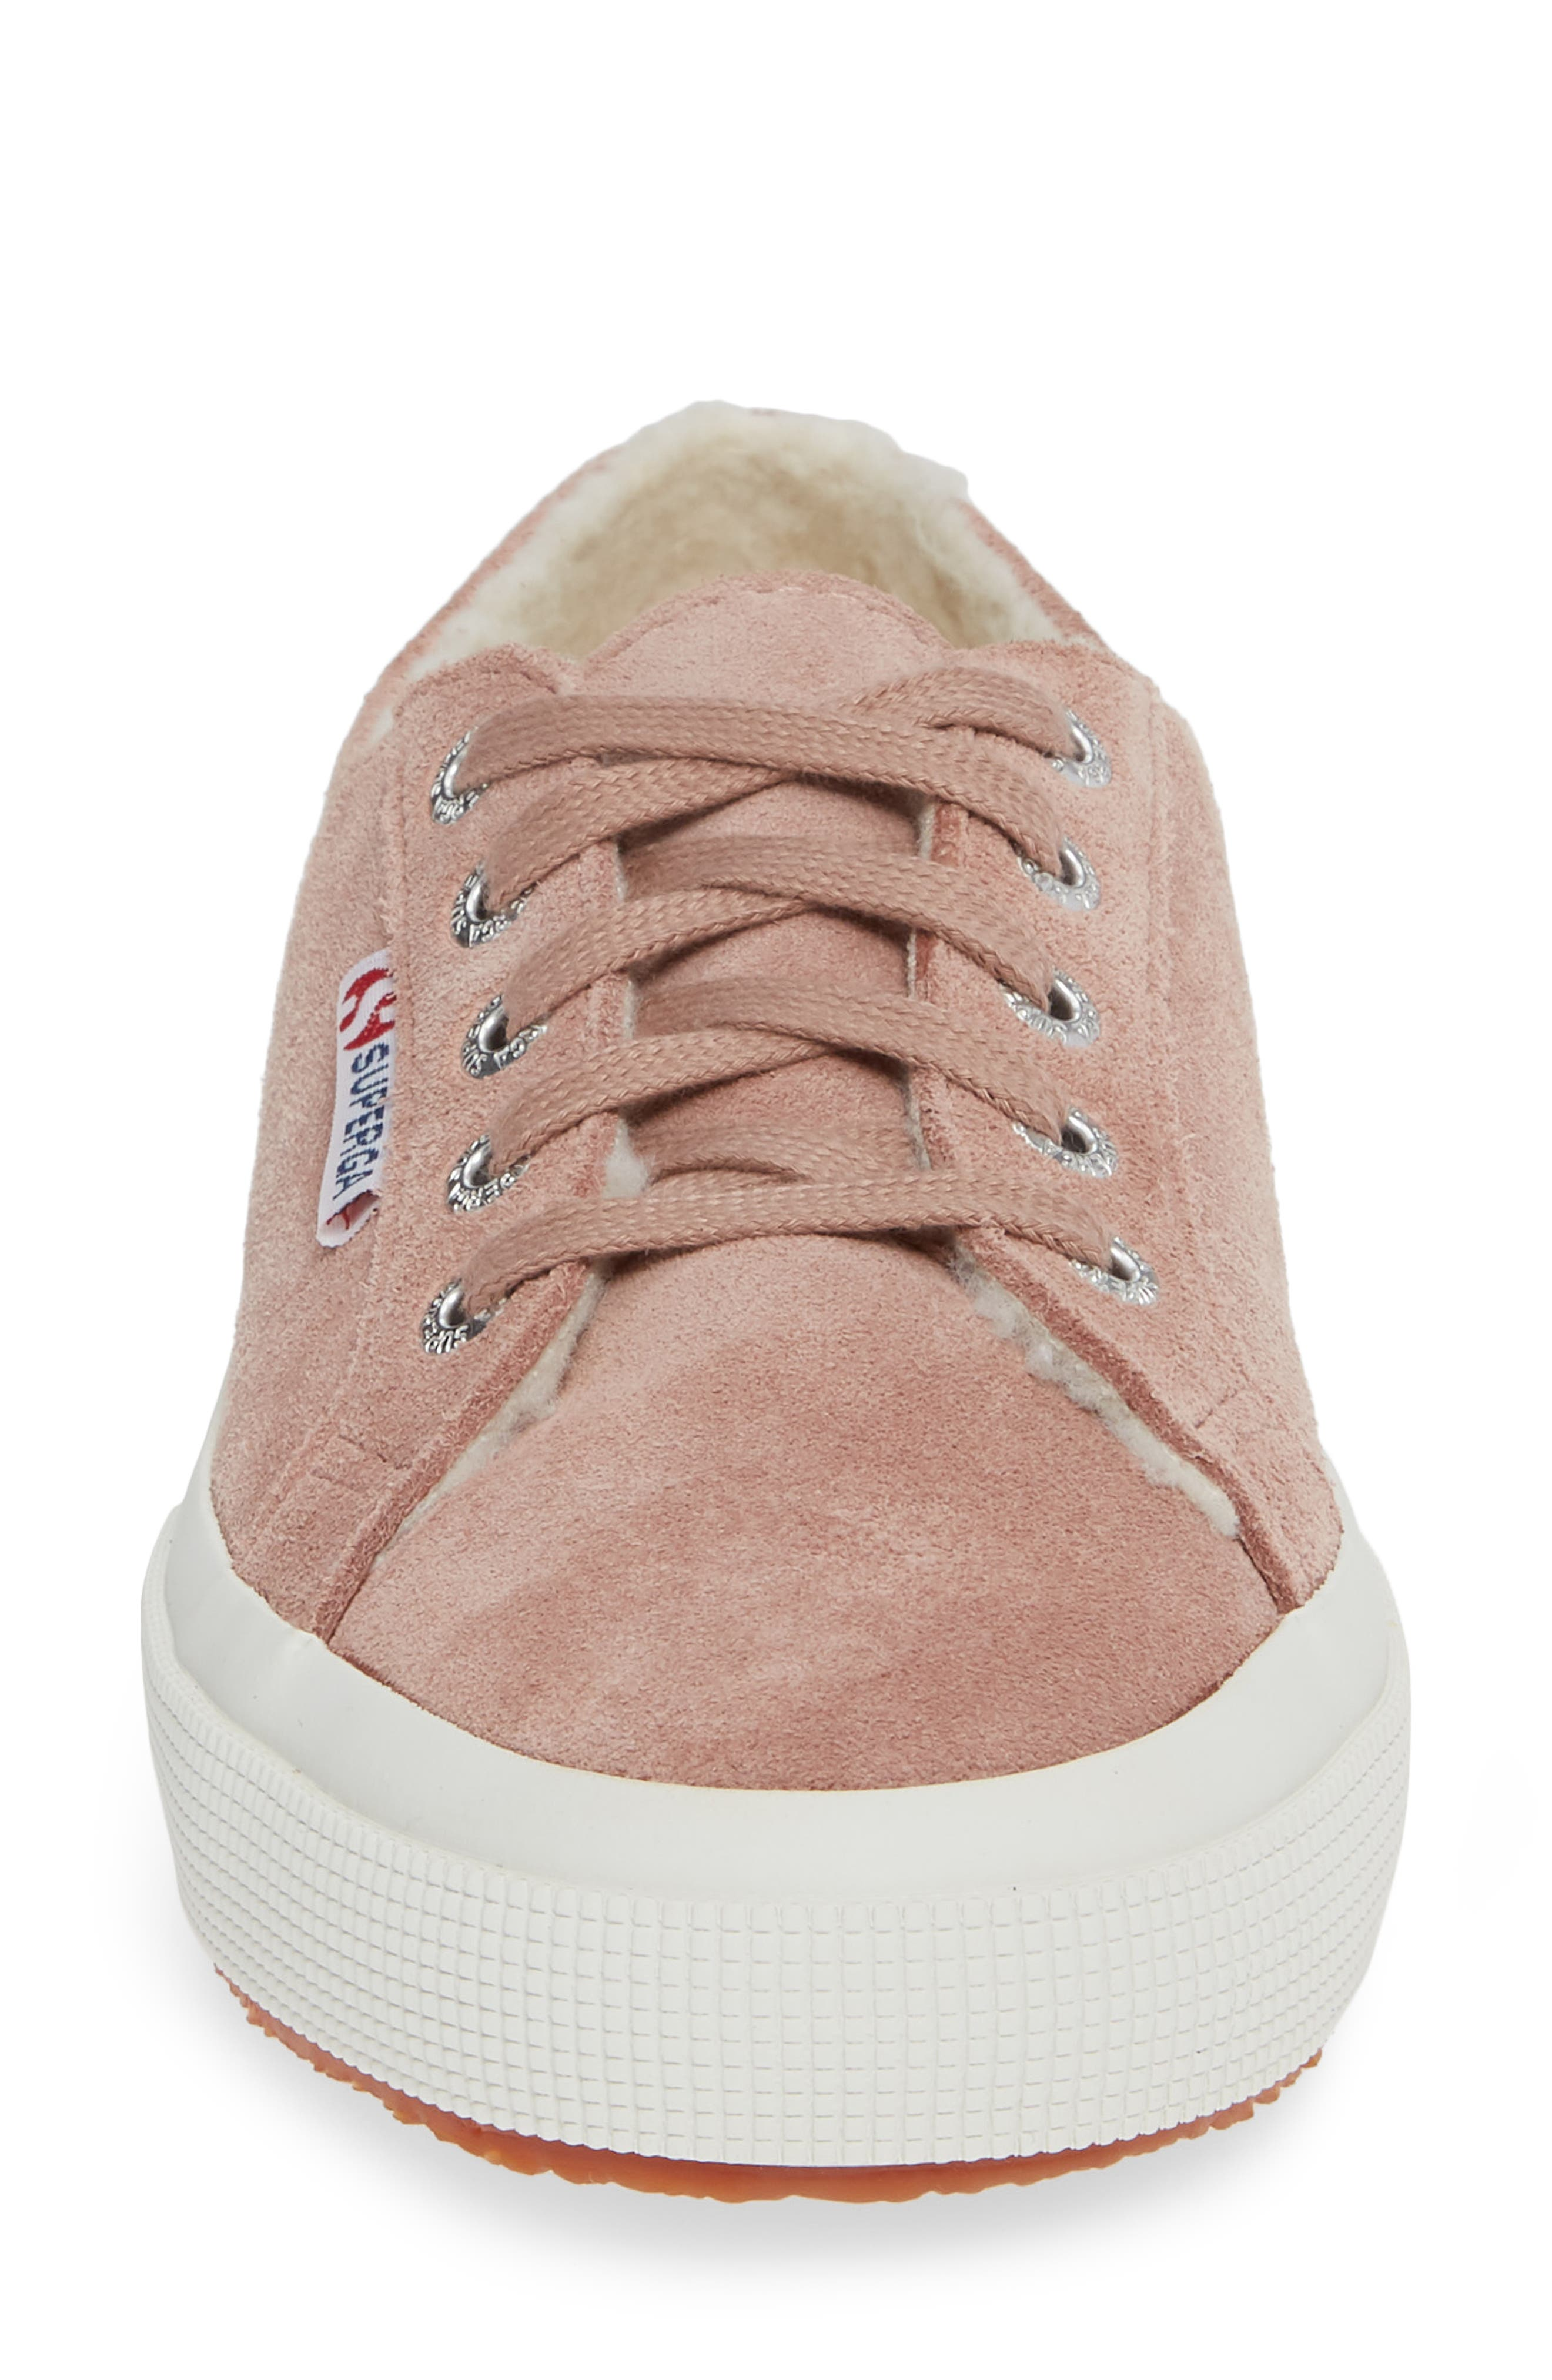 2750 Suefurw Sneaker,                             Alternate thumbnail 4, color,                             ROSE SUEDE